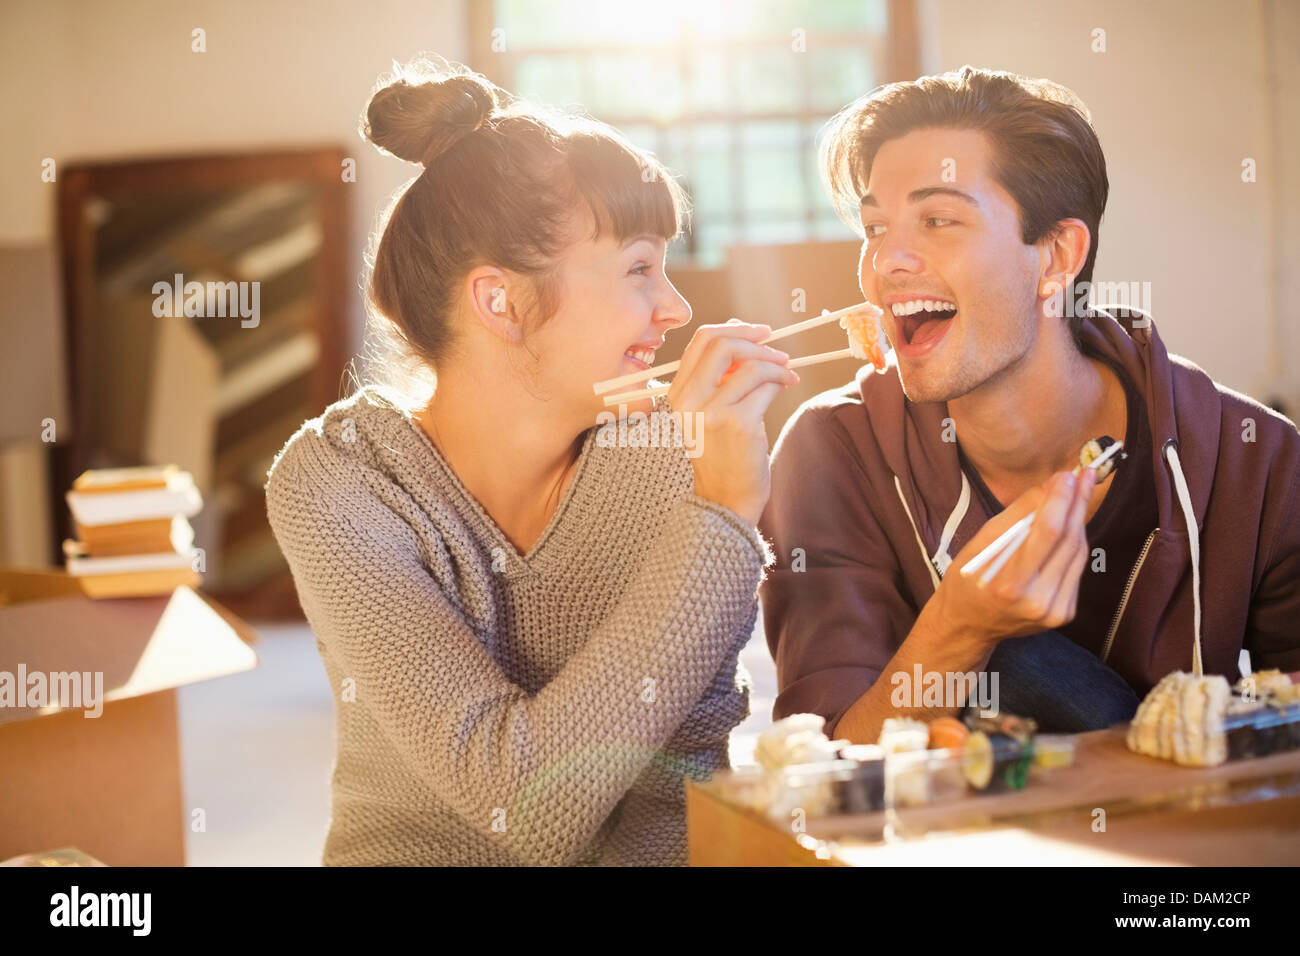 Casal de comer sushi juntos na nova casa Imagens de Stock